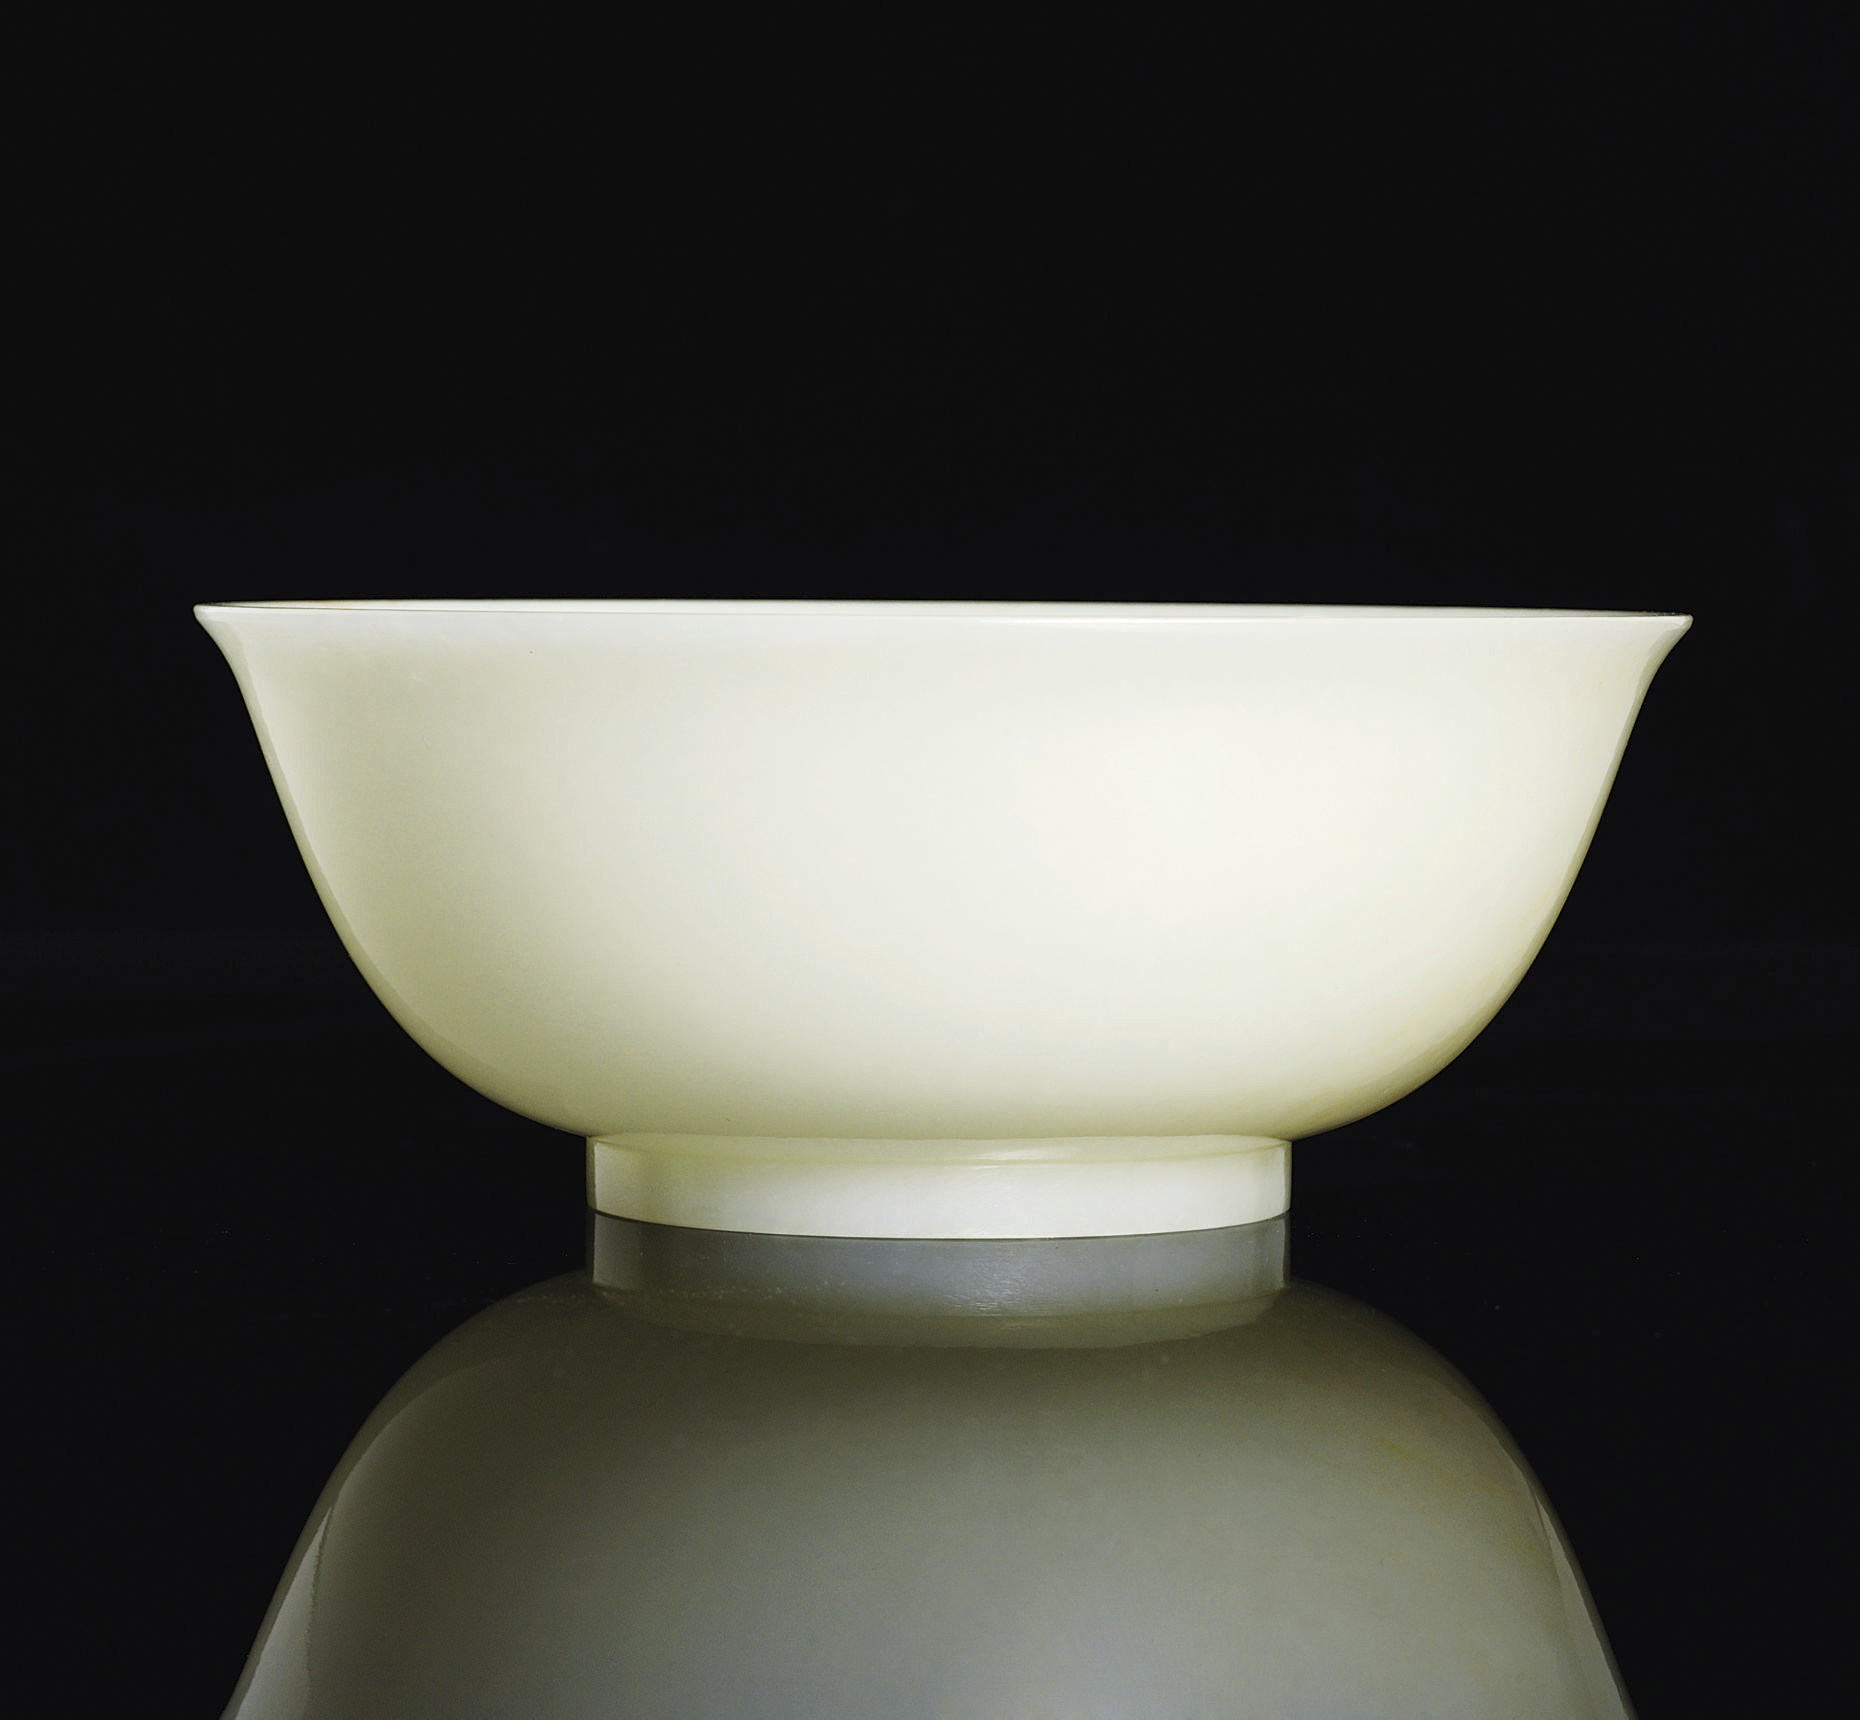 A FINE WHITE JADE BOWL